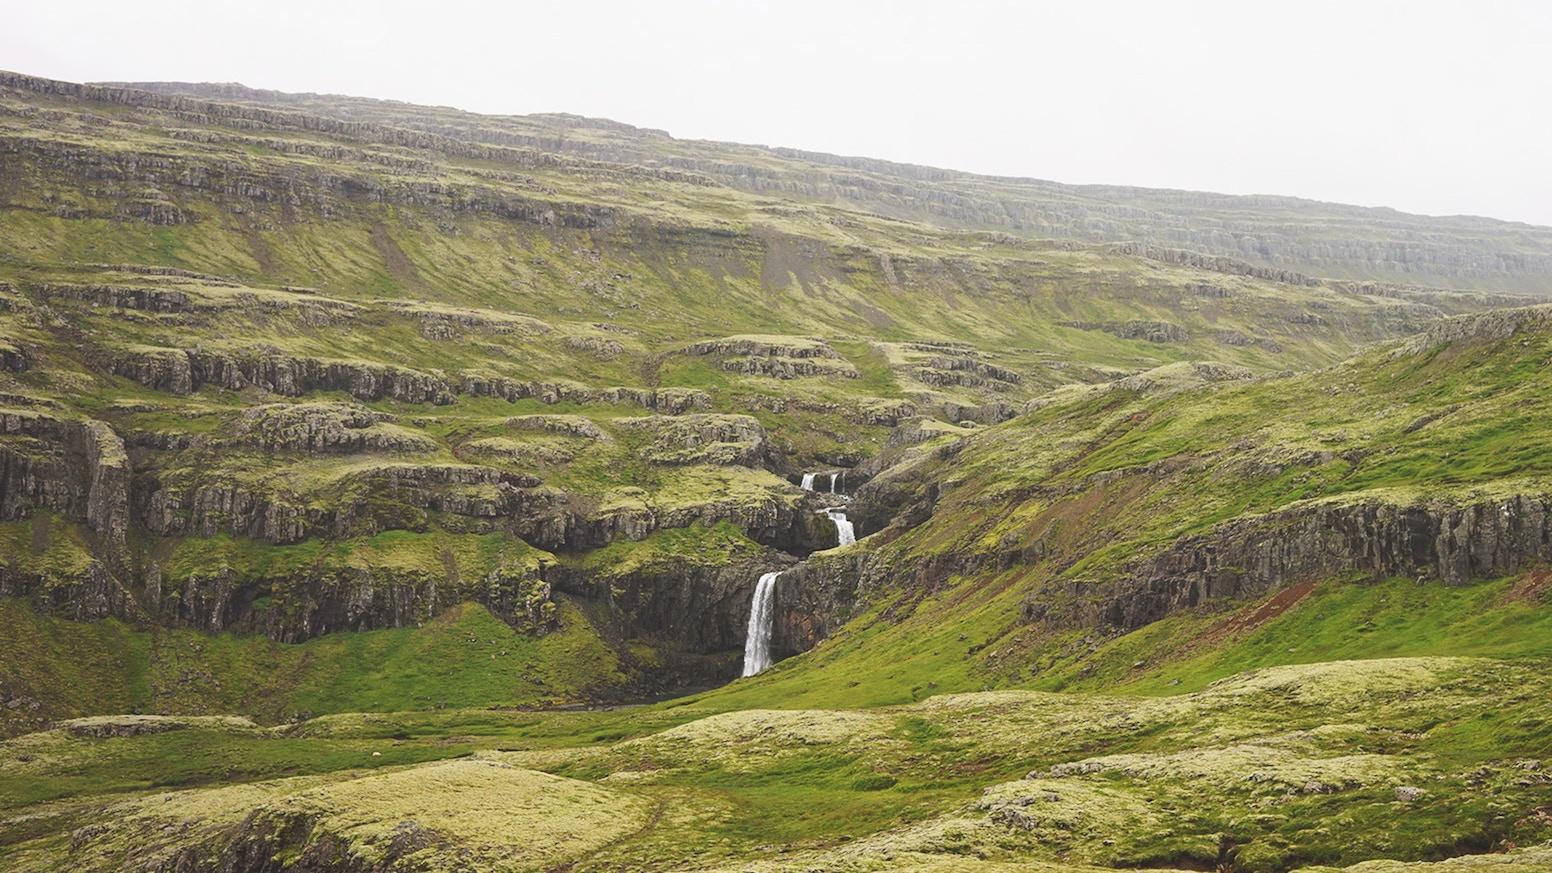 Salt & Wonder: Issue 02 – Rising Tides in Reykjavík